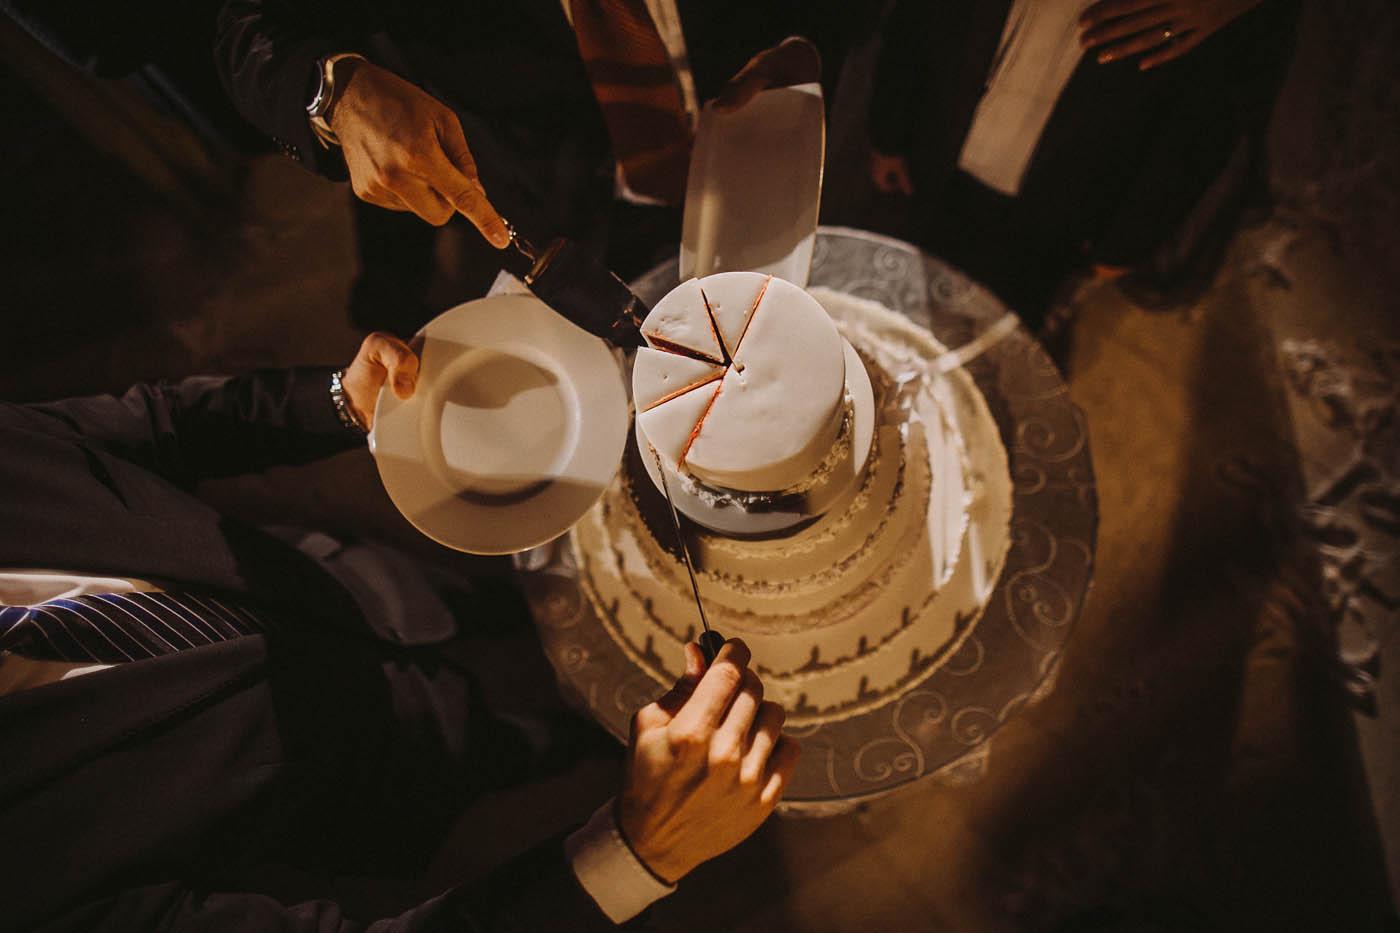 coburg-vienna-wedding-photographer-494